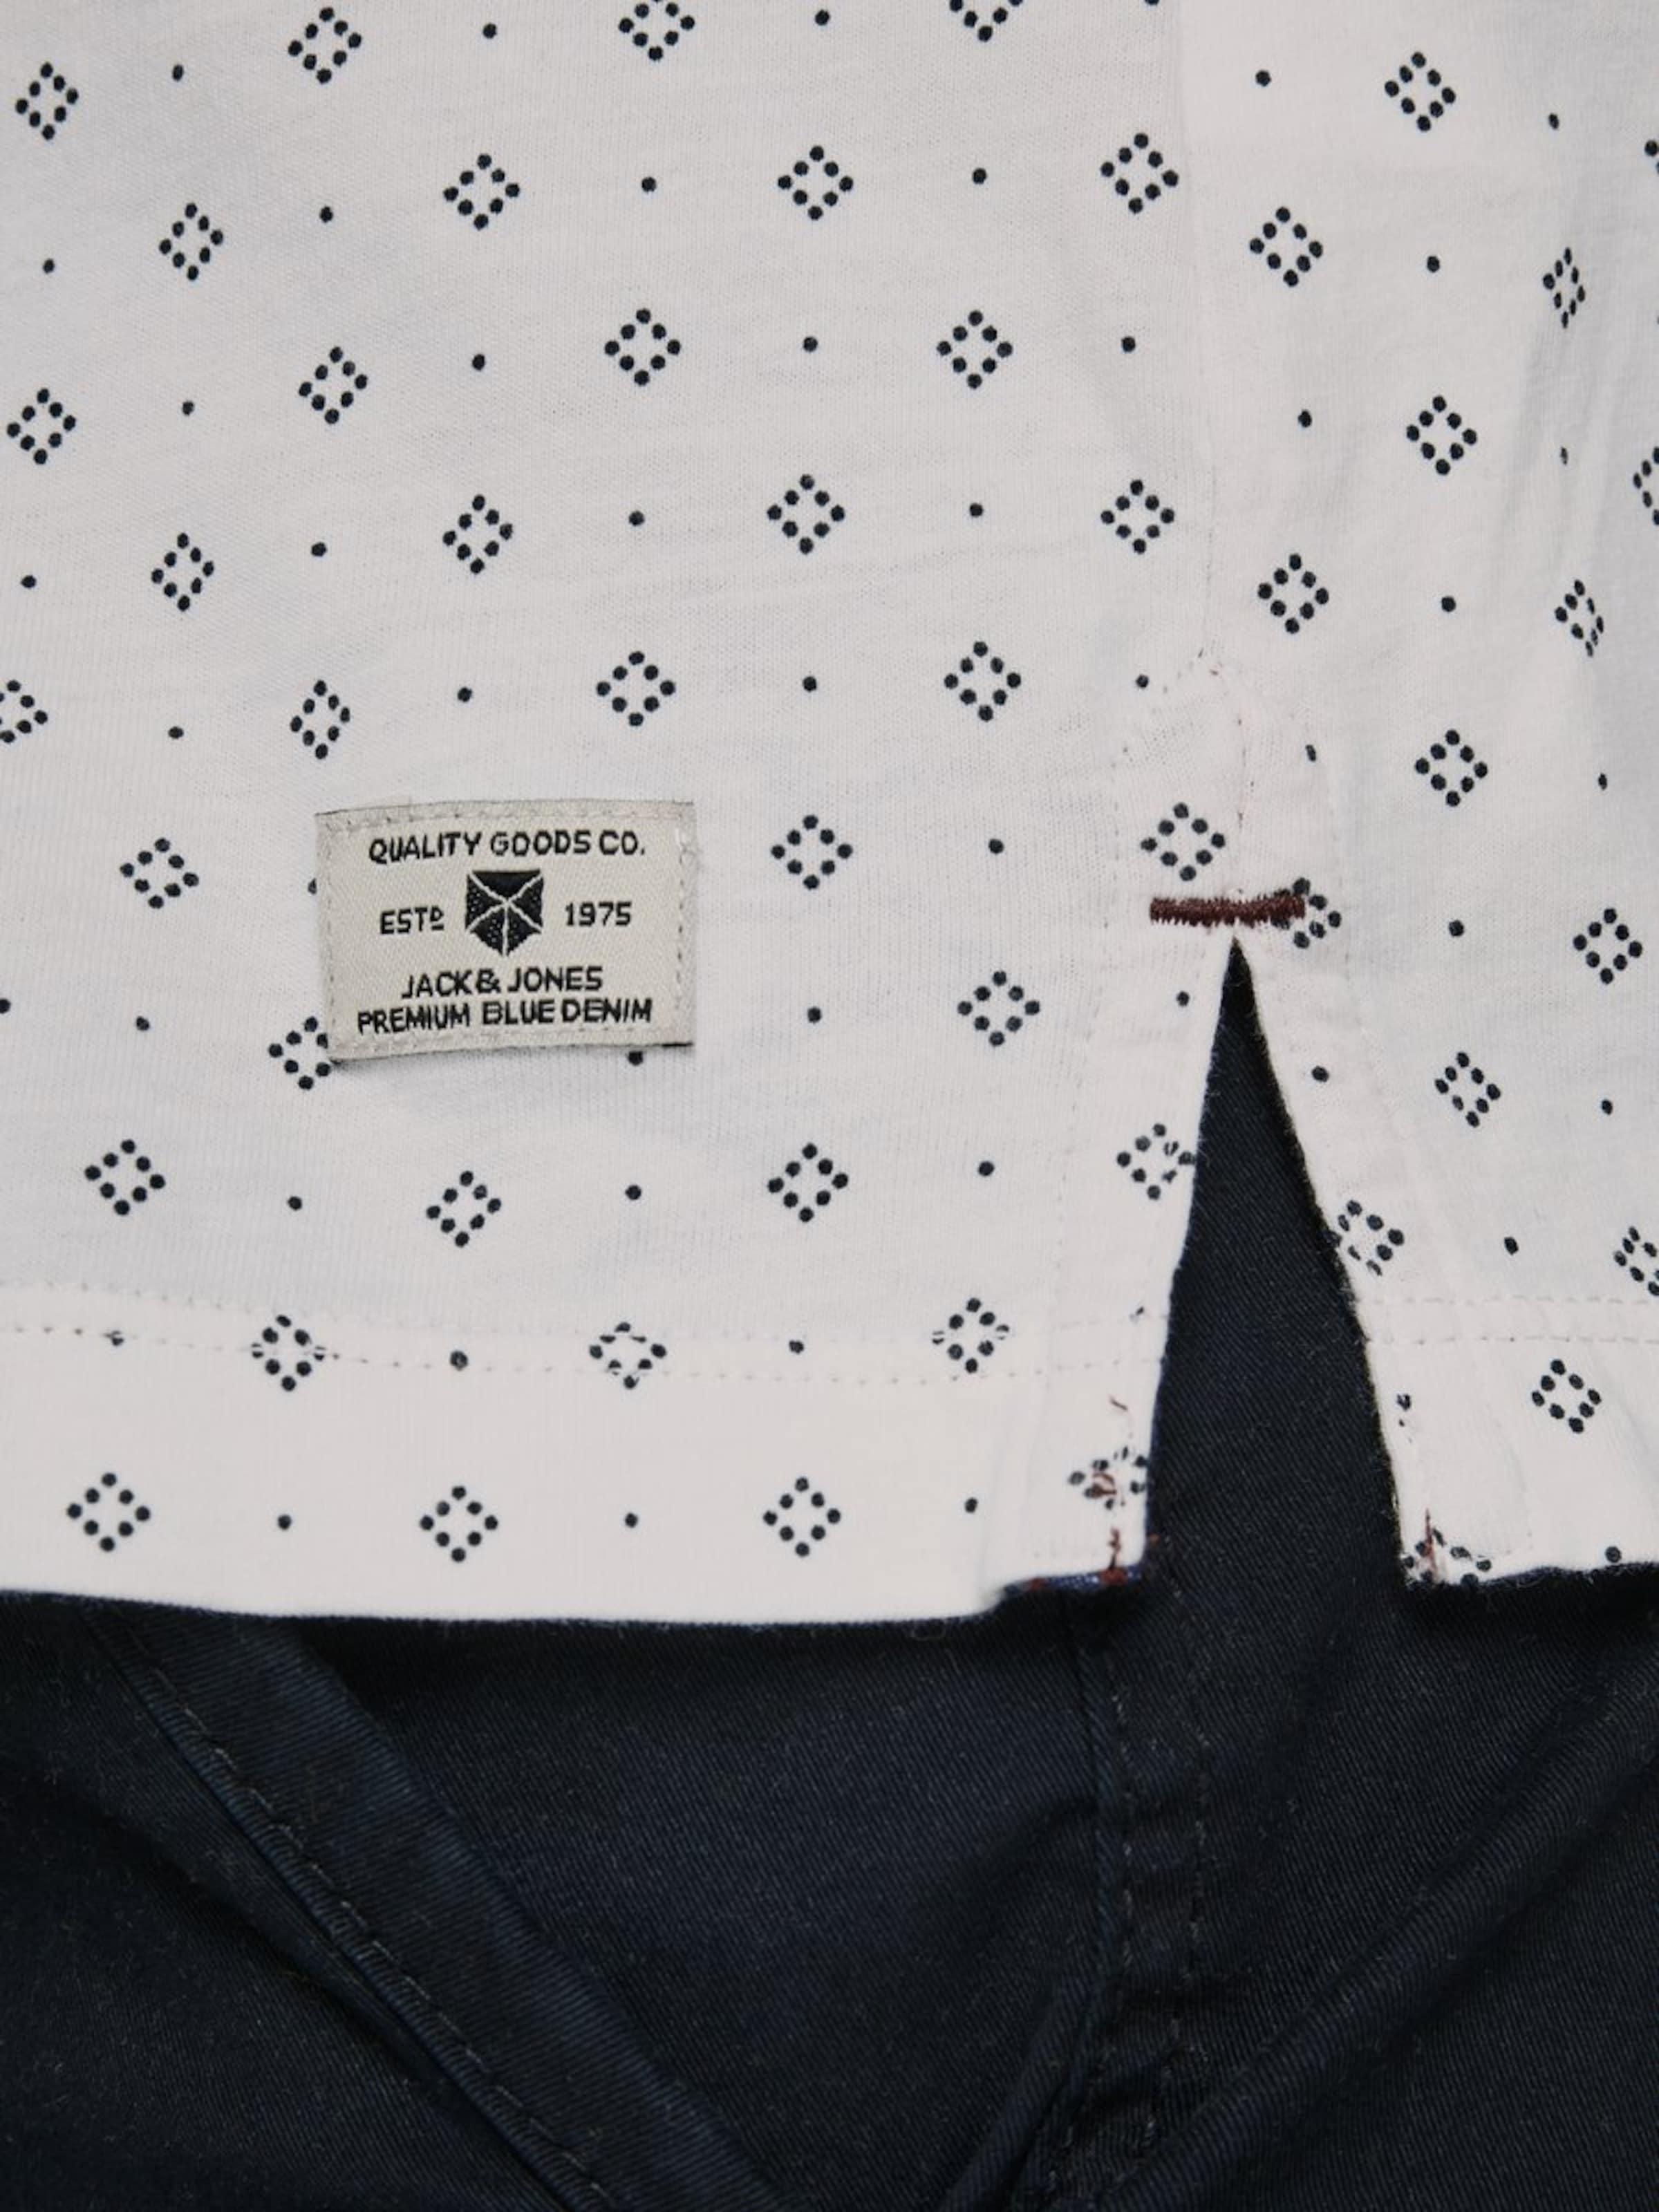 Jackamp; Jones Shirt In SchwarzWeiß SzqVUMLpG